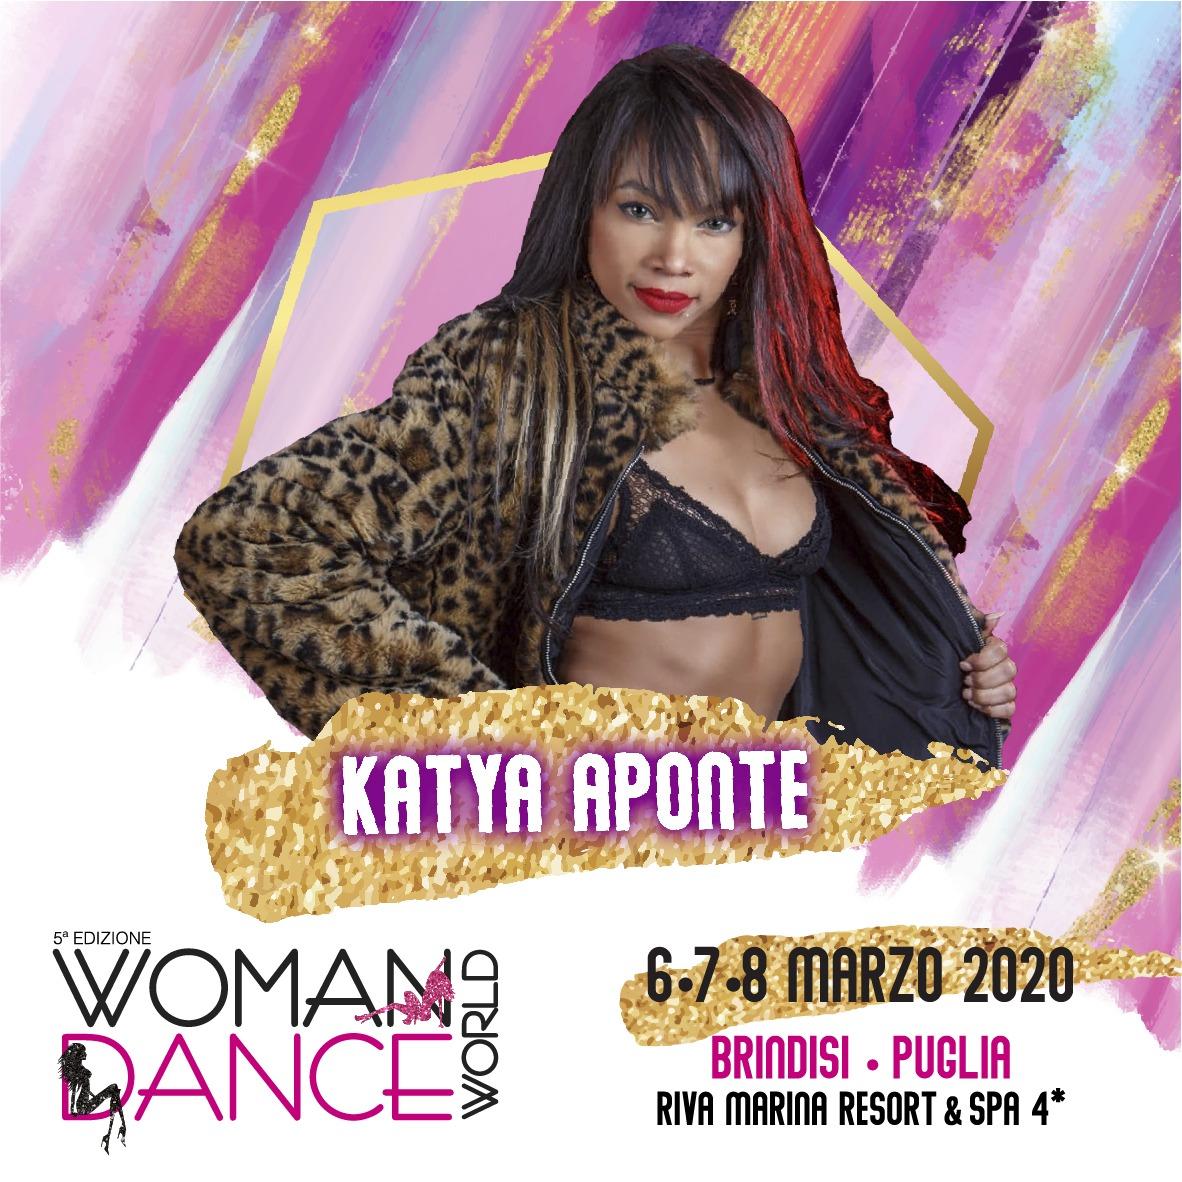 Katya Aponte